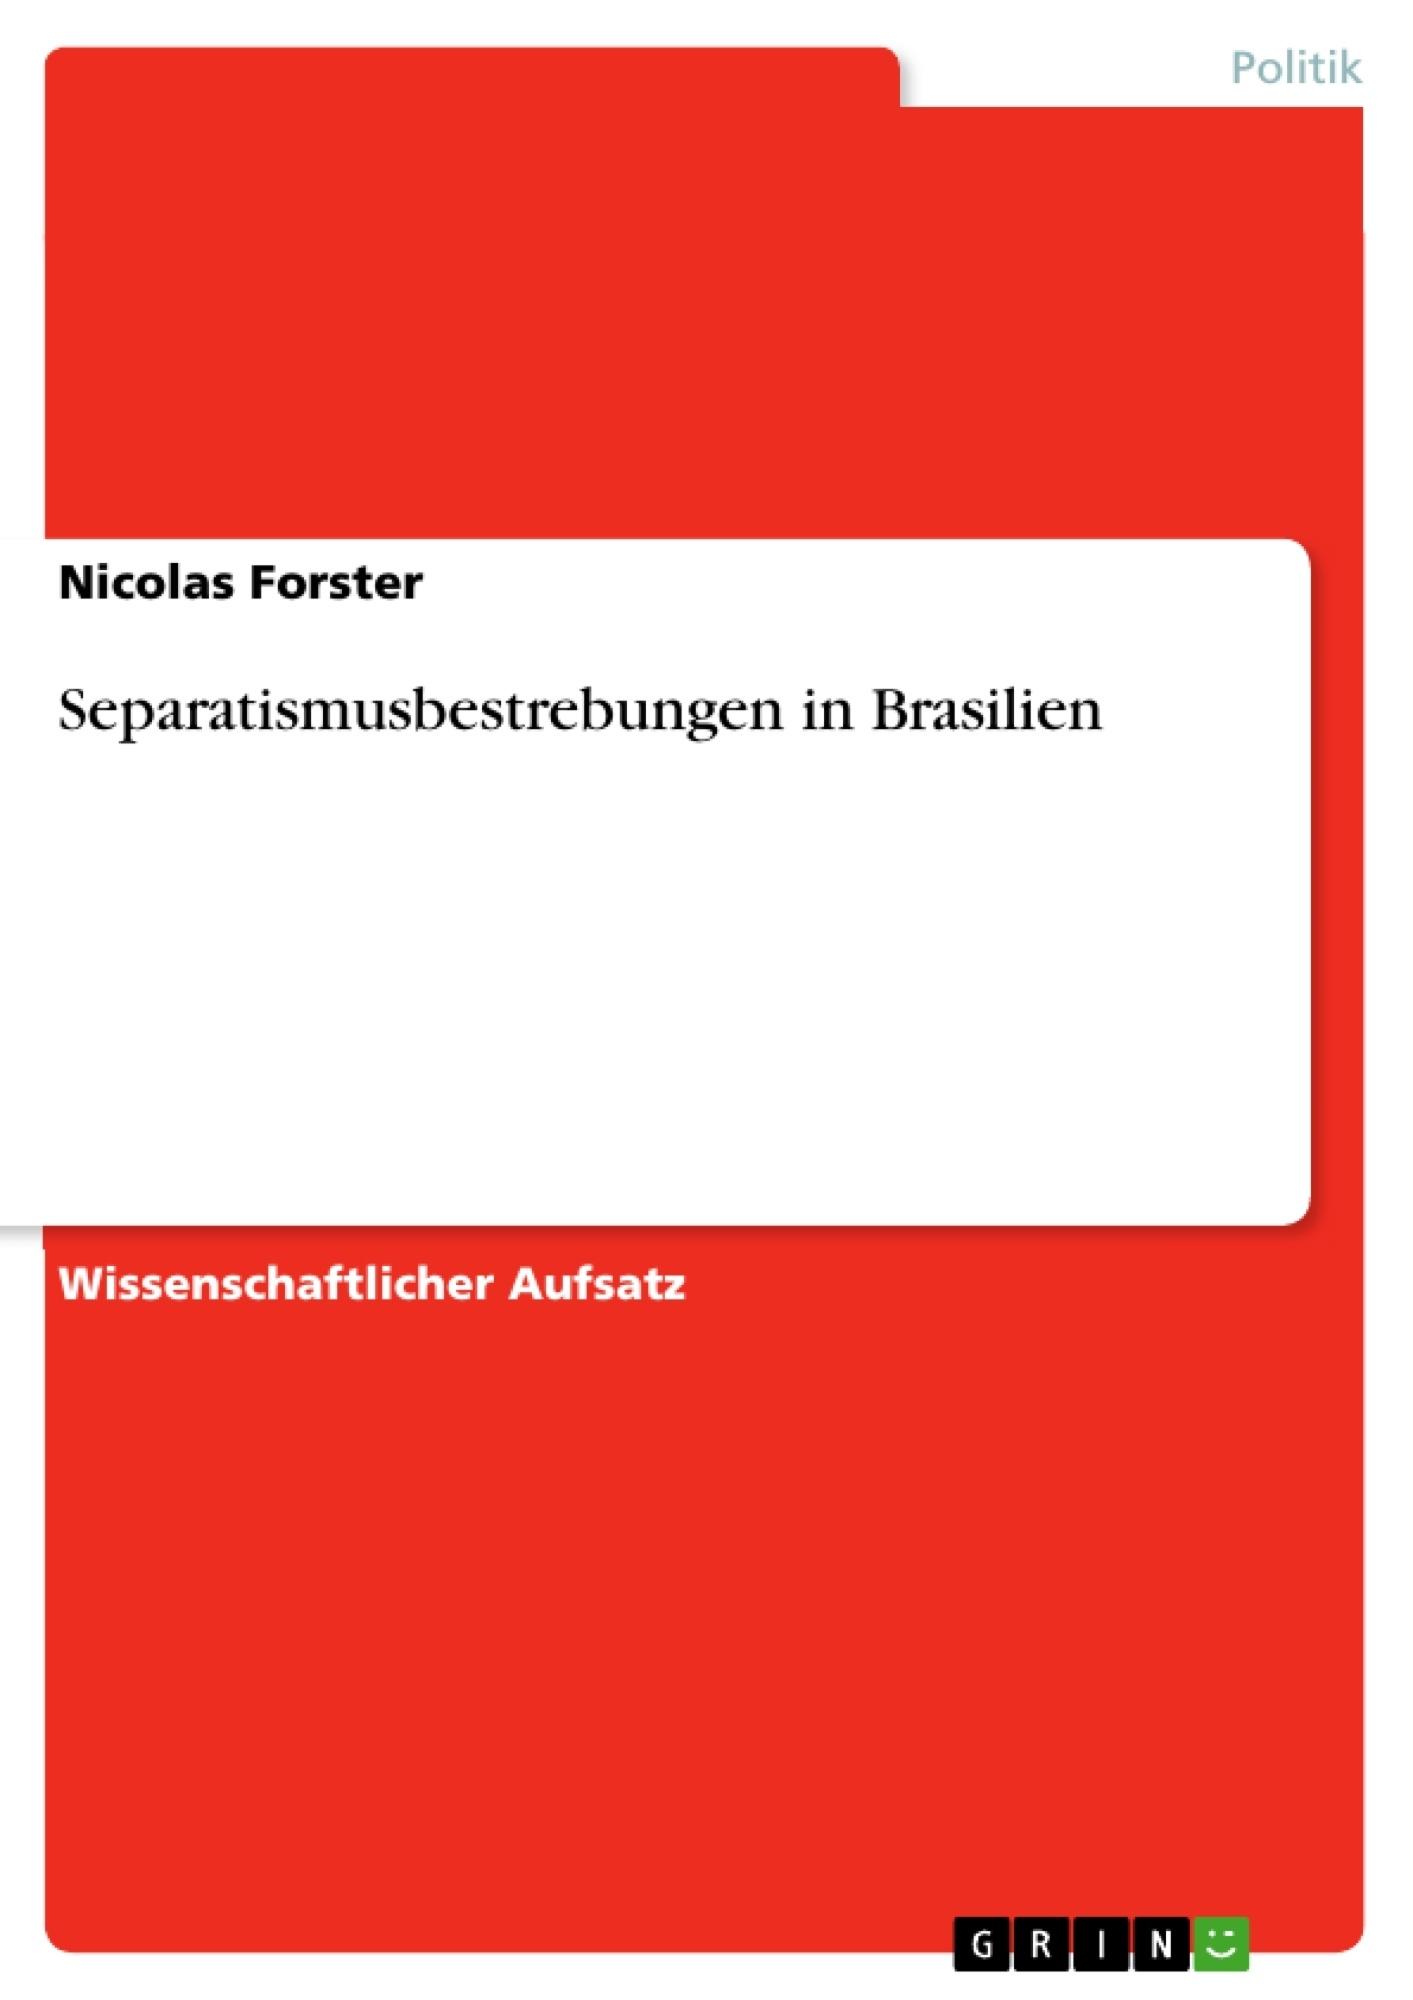 Titel: Separatismusbestrebungen in Brasilien